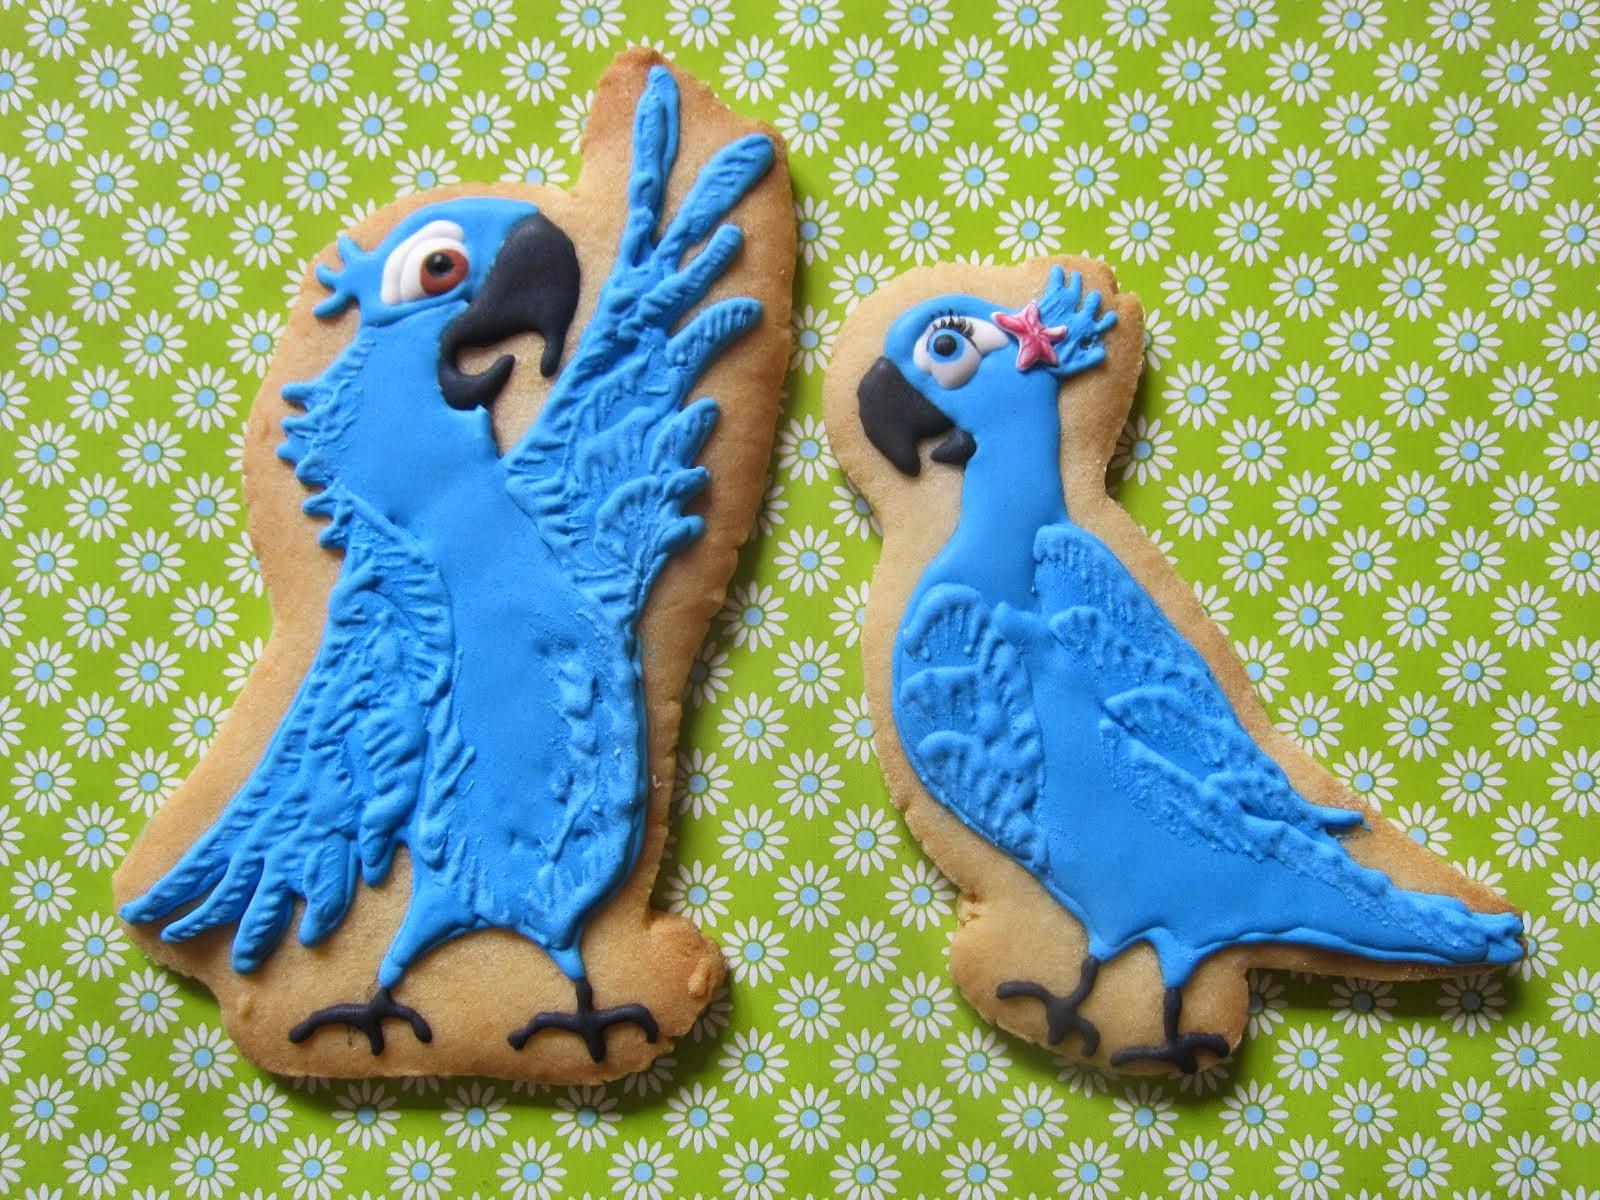 Rio kekszek / Rio cookies